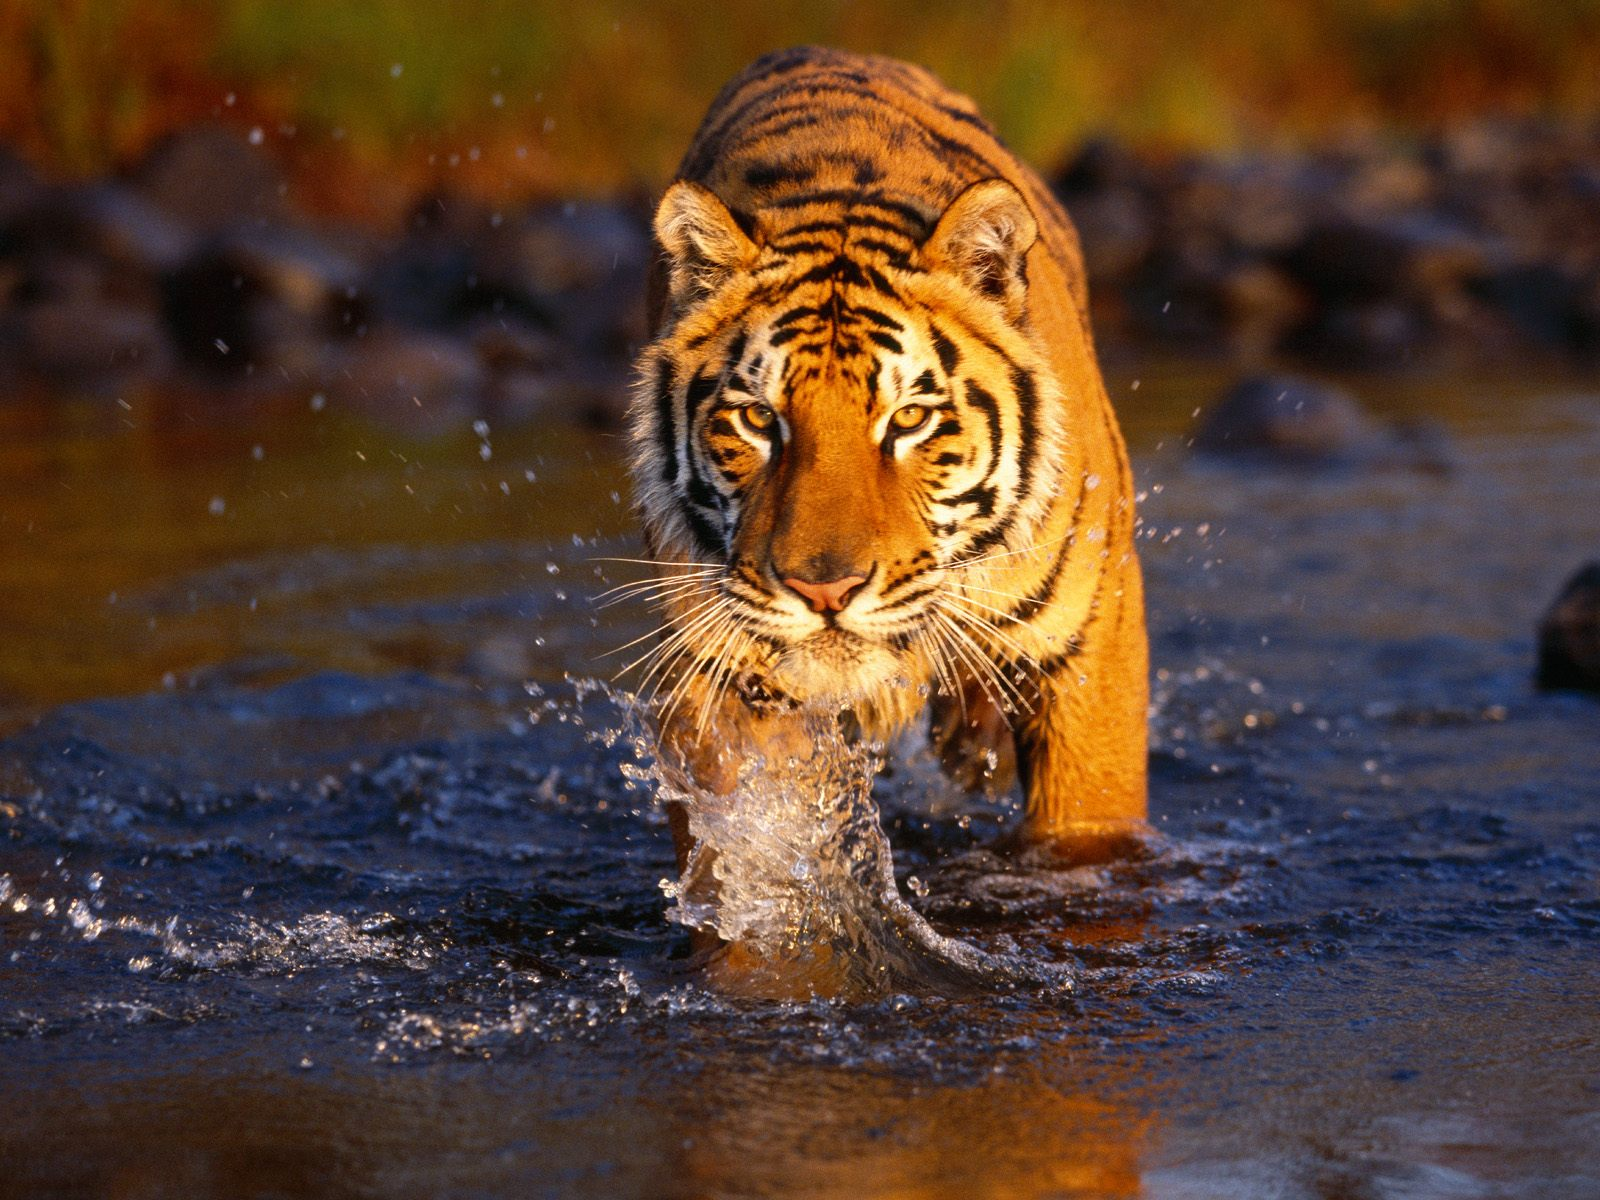 Japan Tigers Hd Wallpapers Tiger Wallpaper For Desktop Backgrounds Free